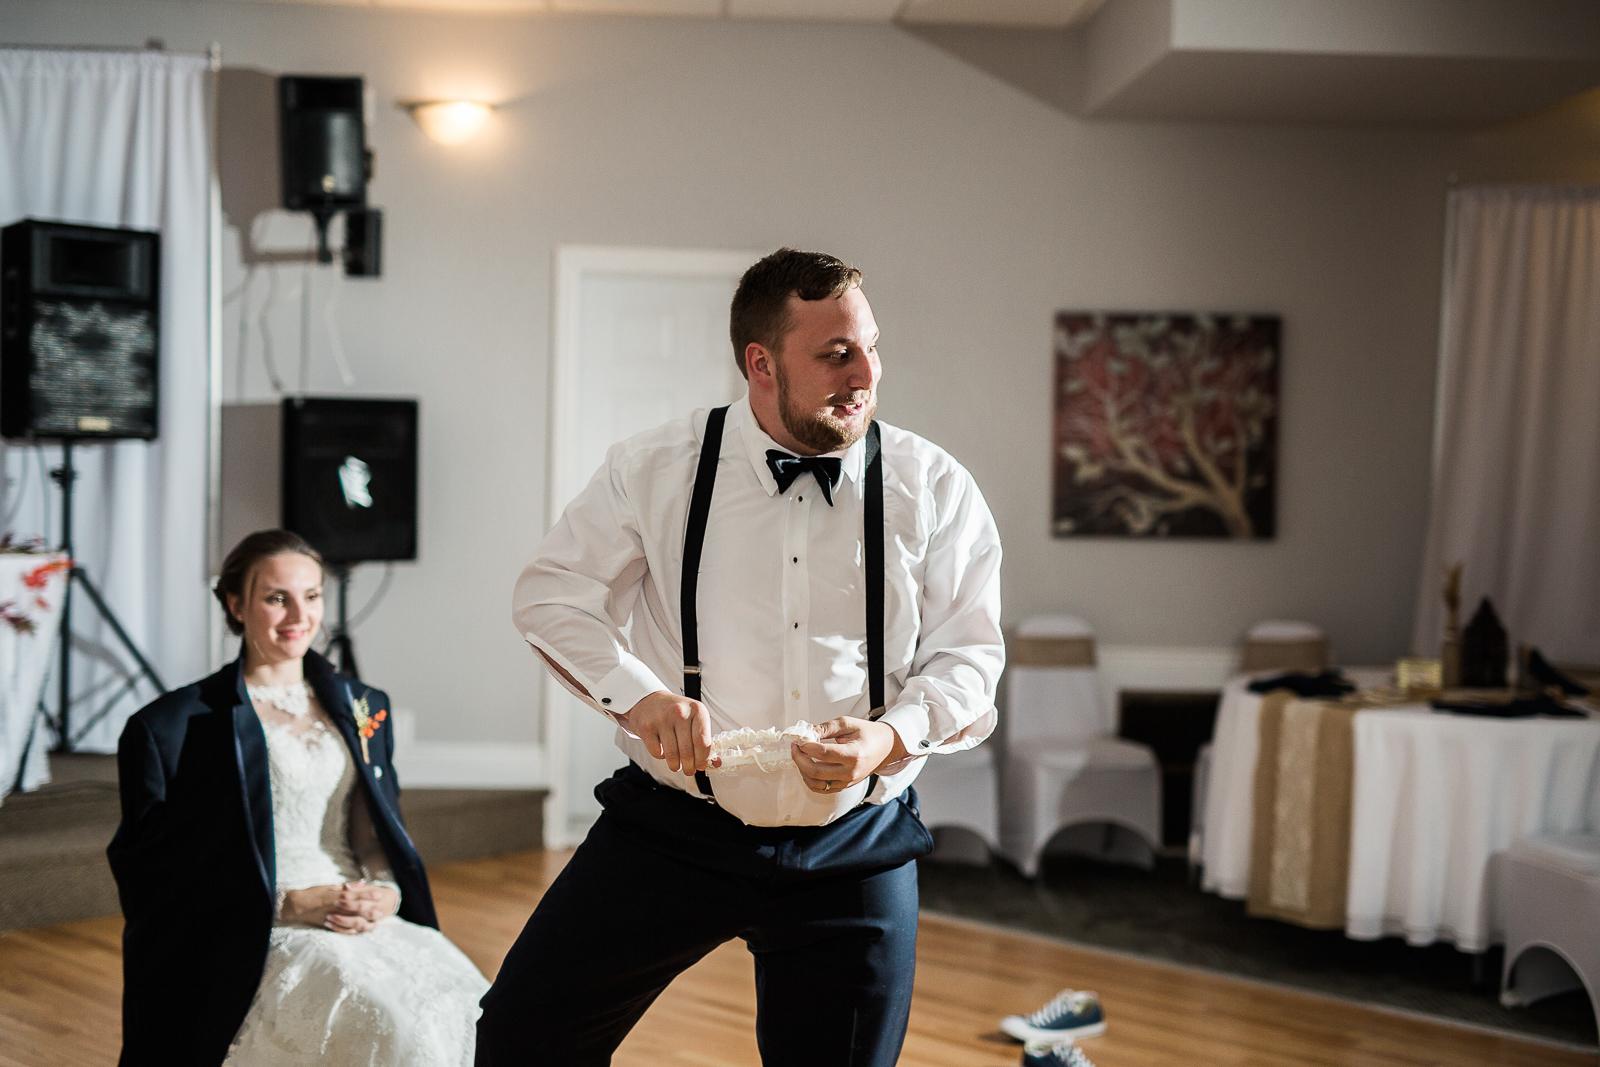 gander-wedding-photographer-159.jpg